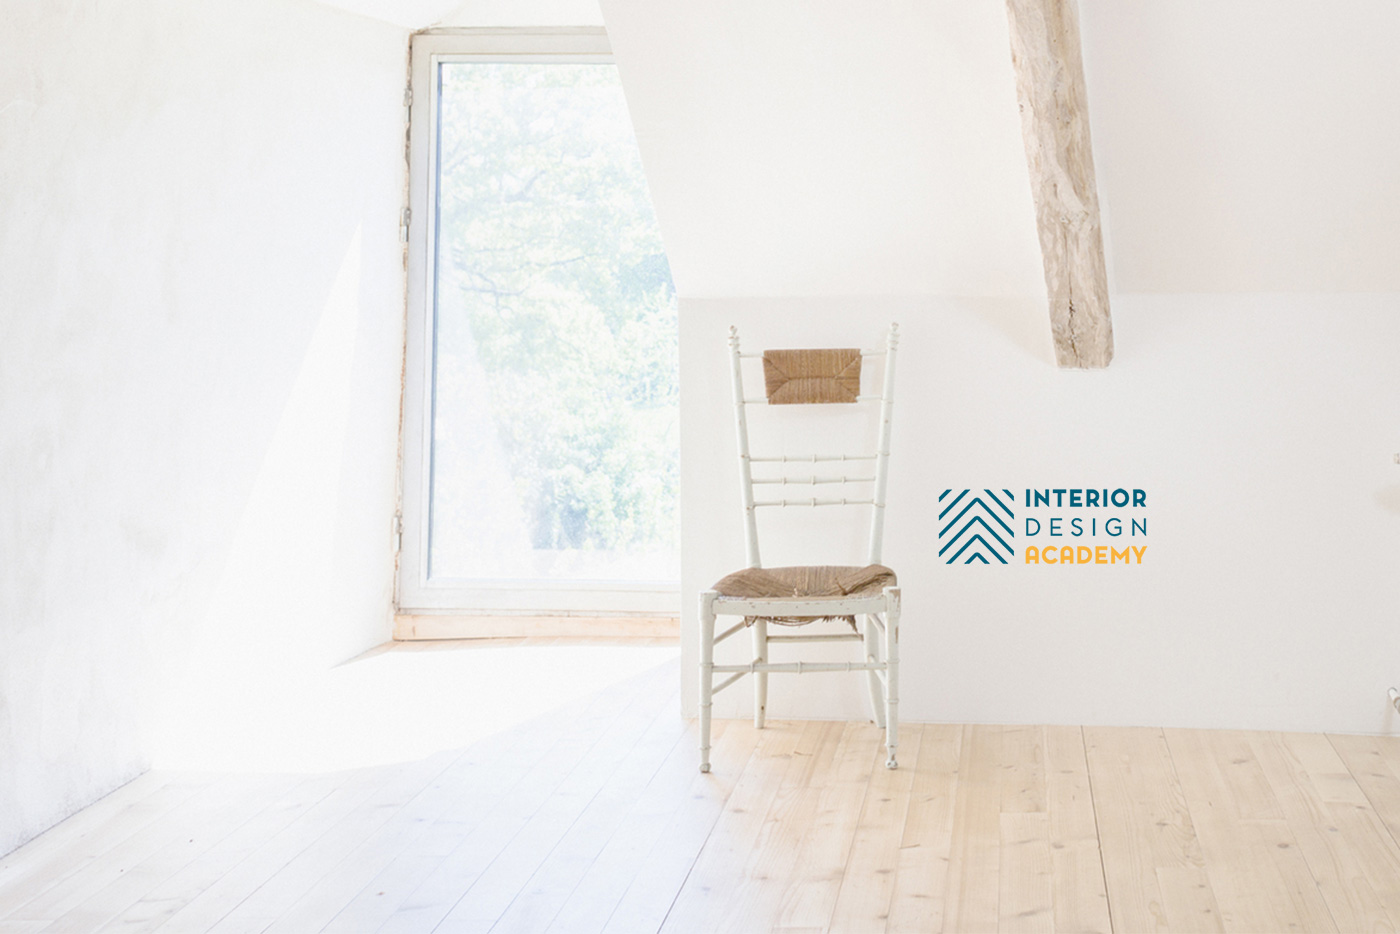 Interior Design Academy | Milano